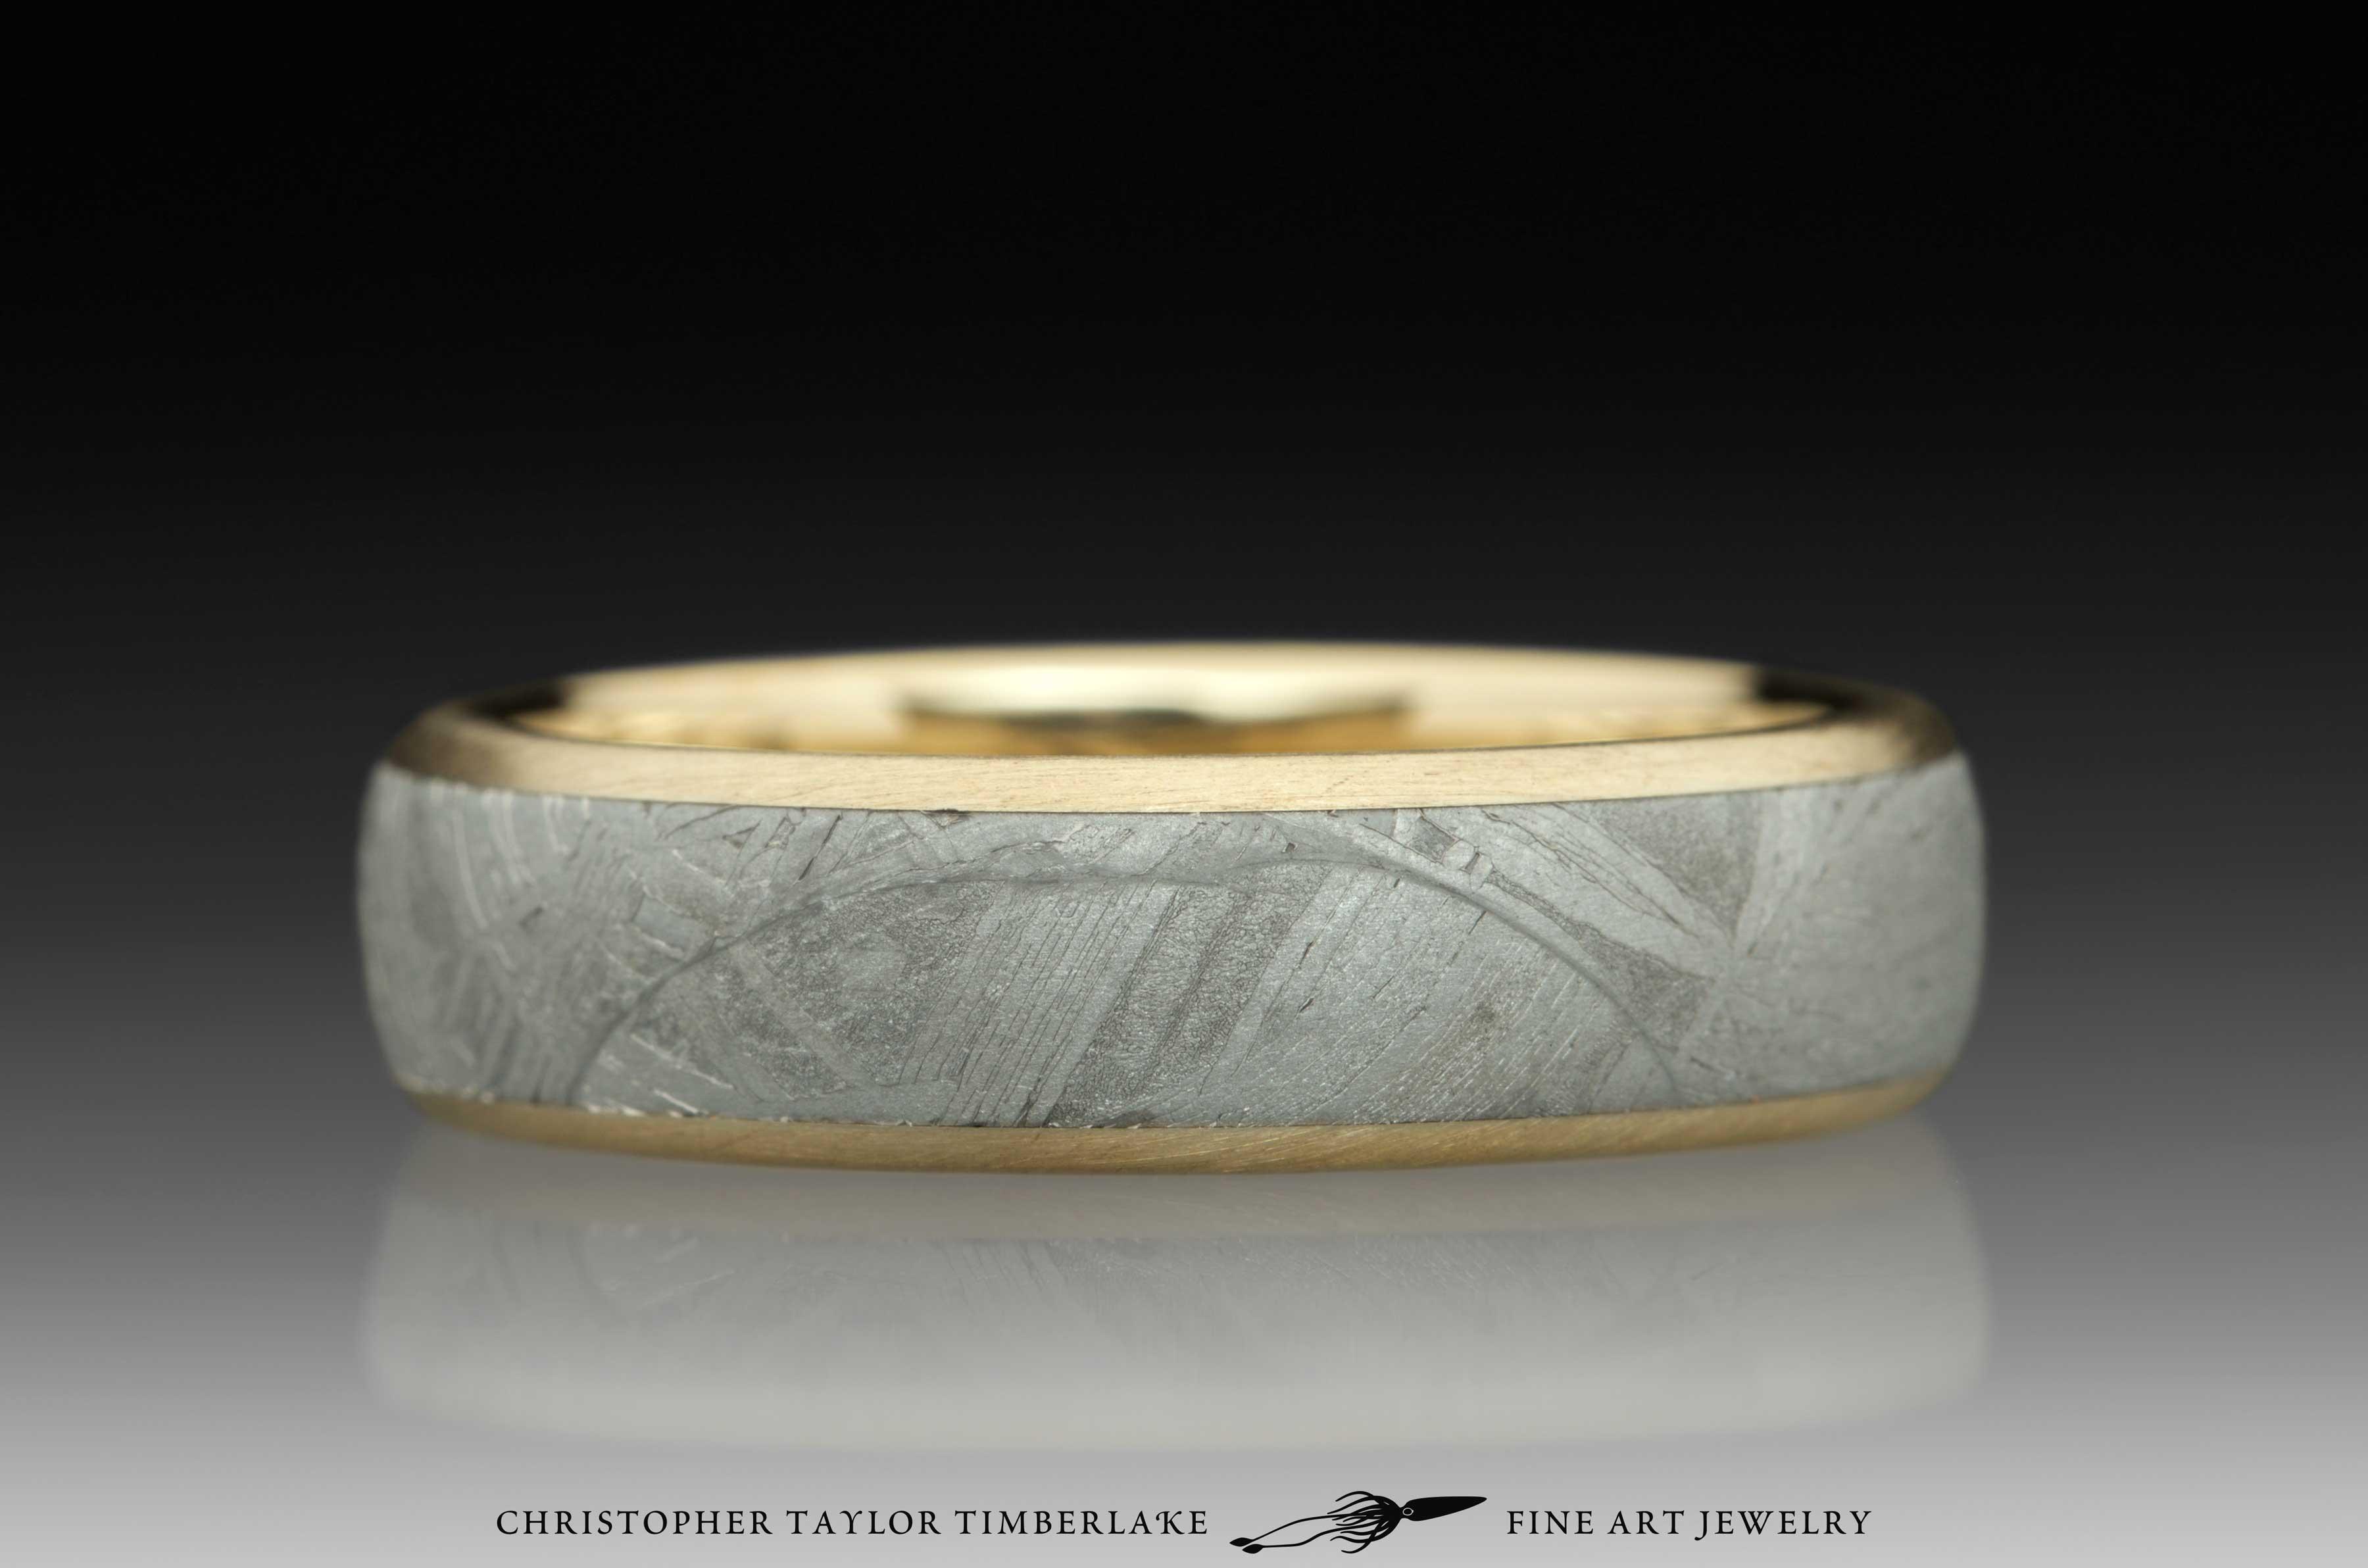 Meteorite-14K-karat-yellow-gold-ring,-domed,-etched,-(.75-4.5-.75)-6mm,-14K-yellow-gold-rims-2